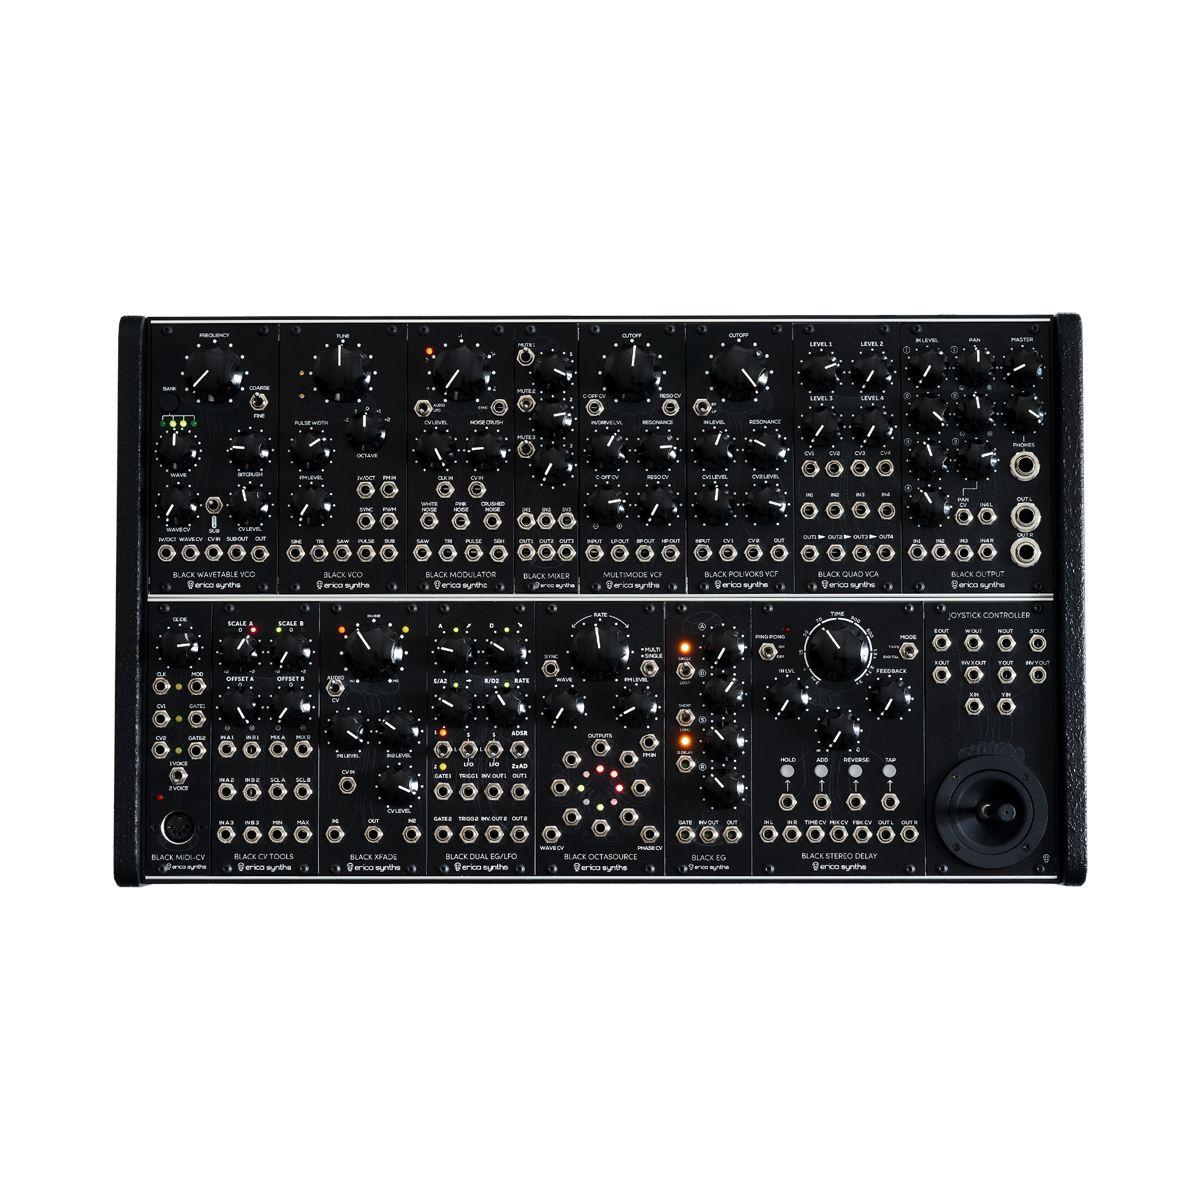 Erica Synths Black System II Eurorack Modular Synth Instrument